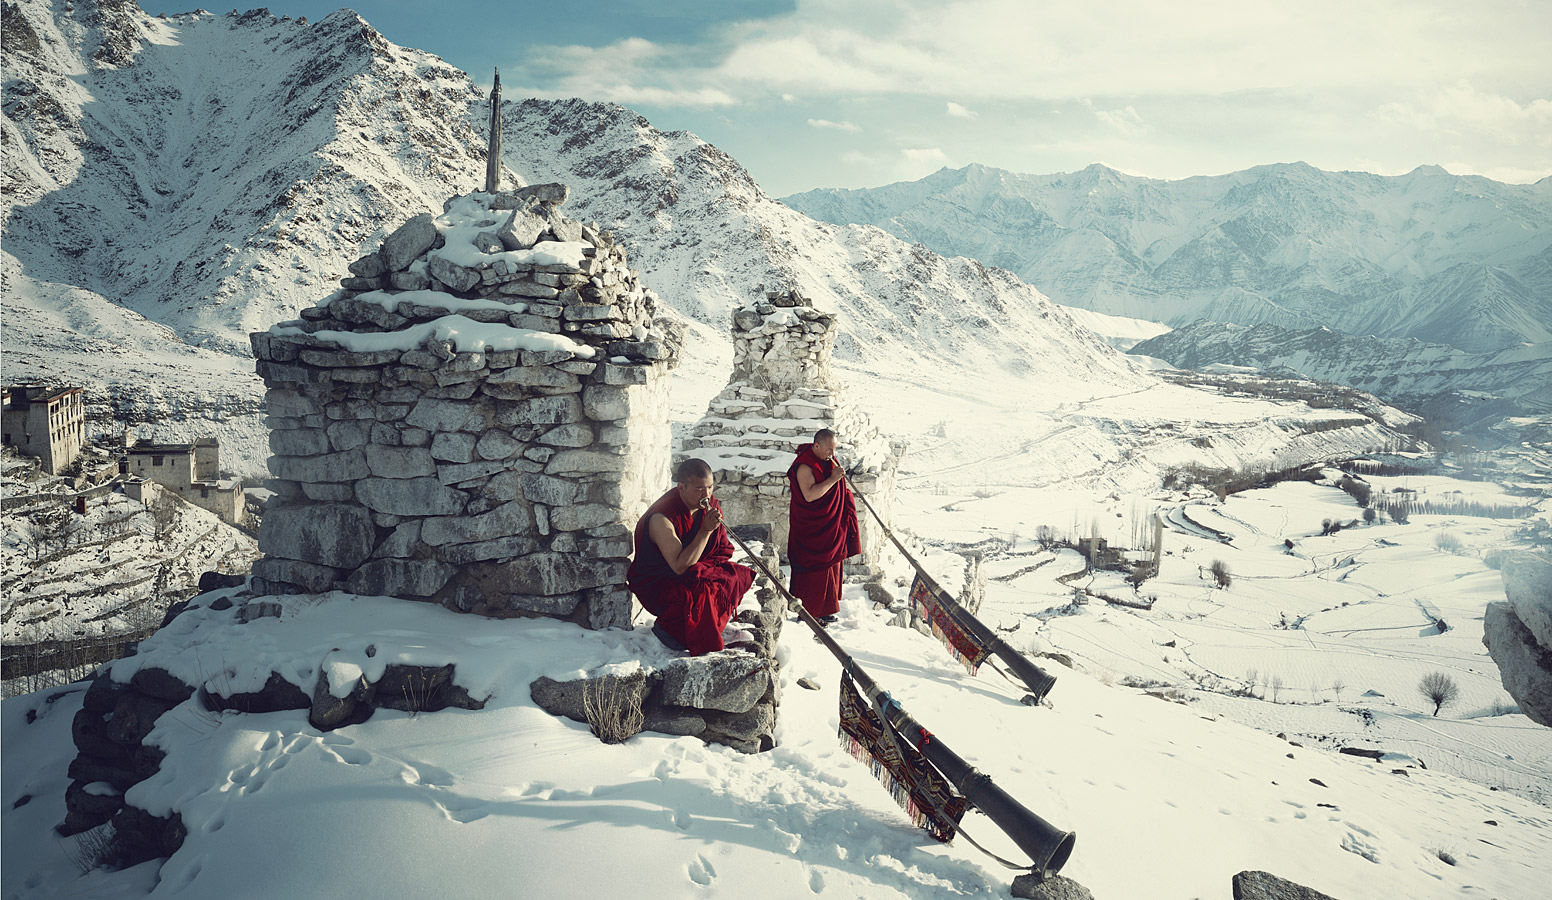 Trip to Leh and Ladakh